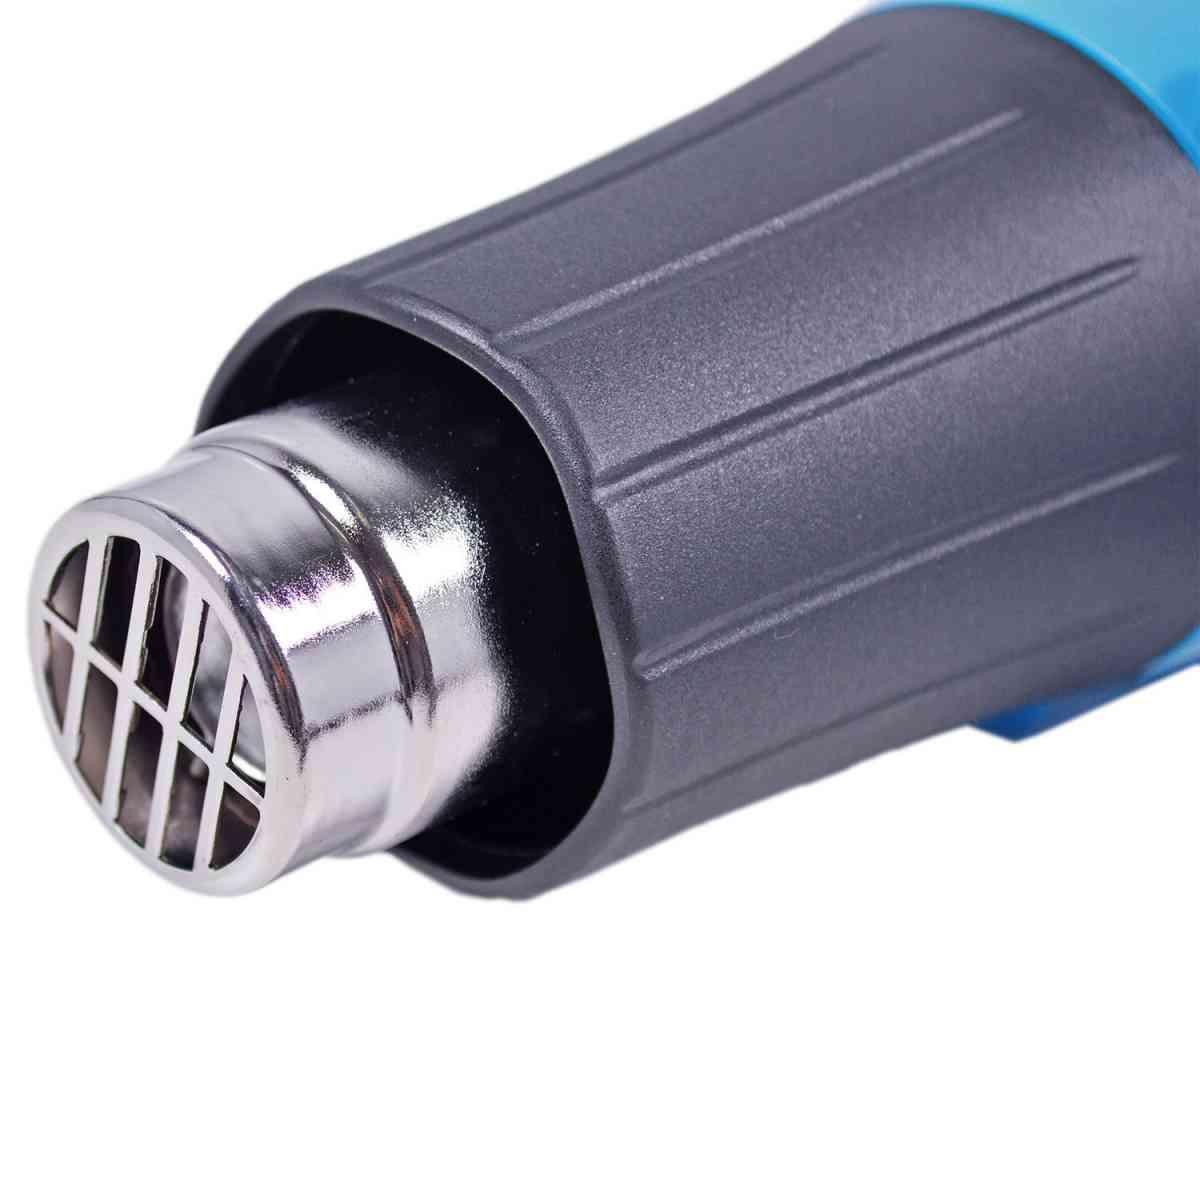 Soprador Térmico 1500W G1935/BR1 Gamma - 127 Volts